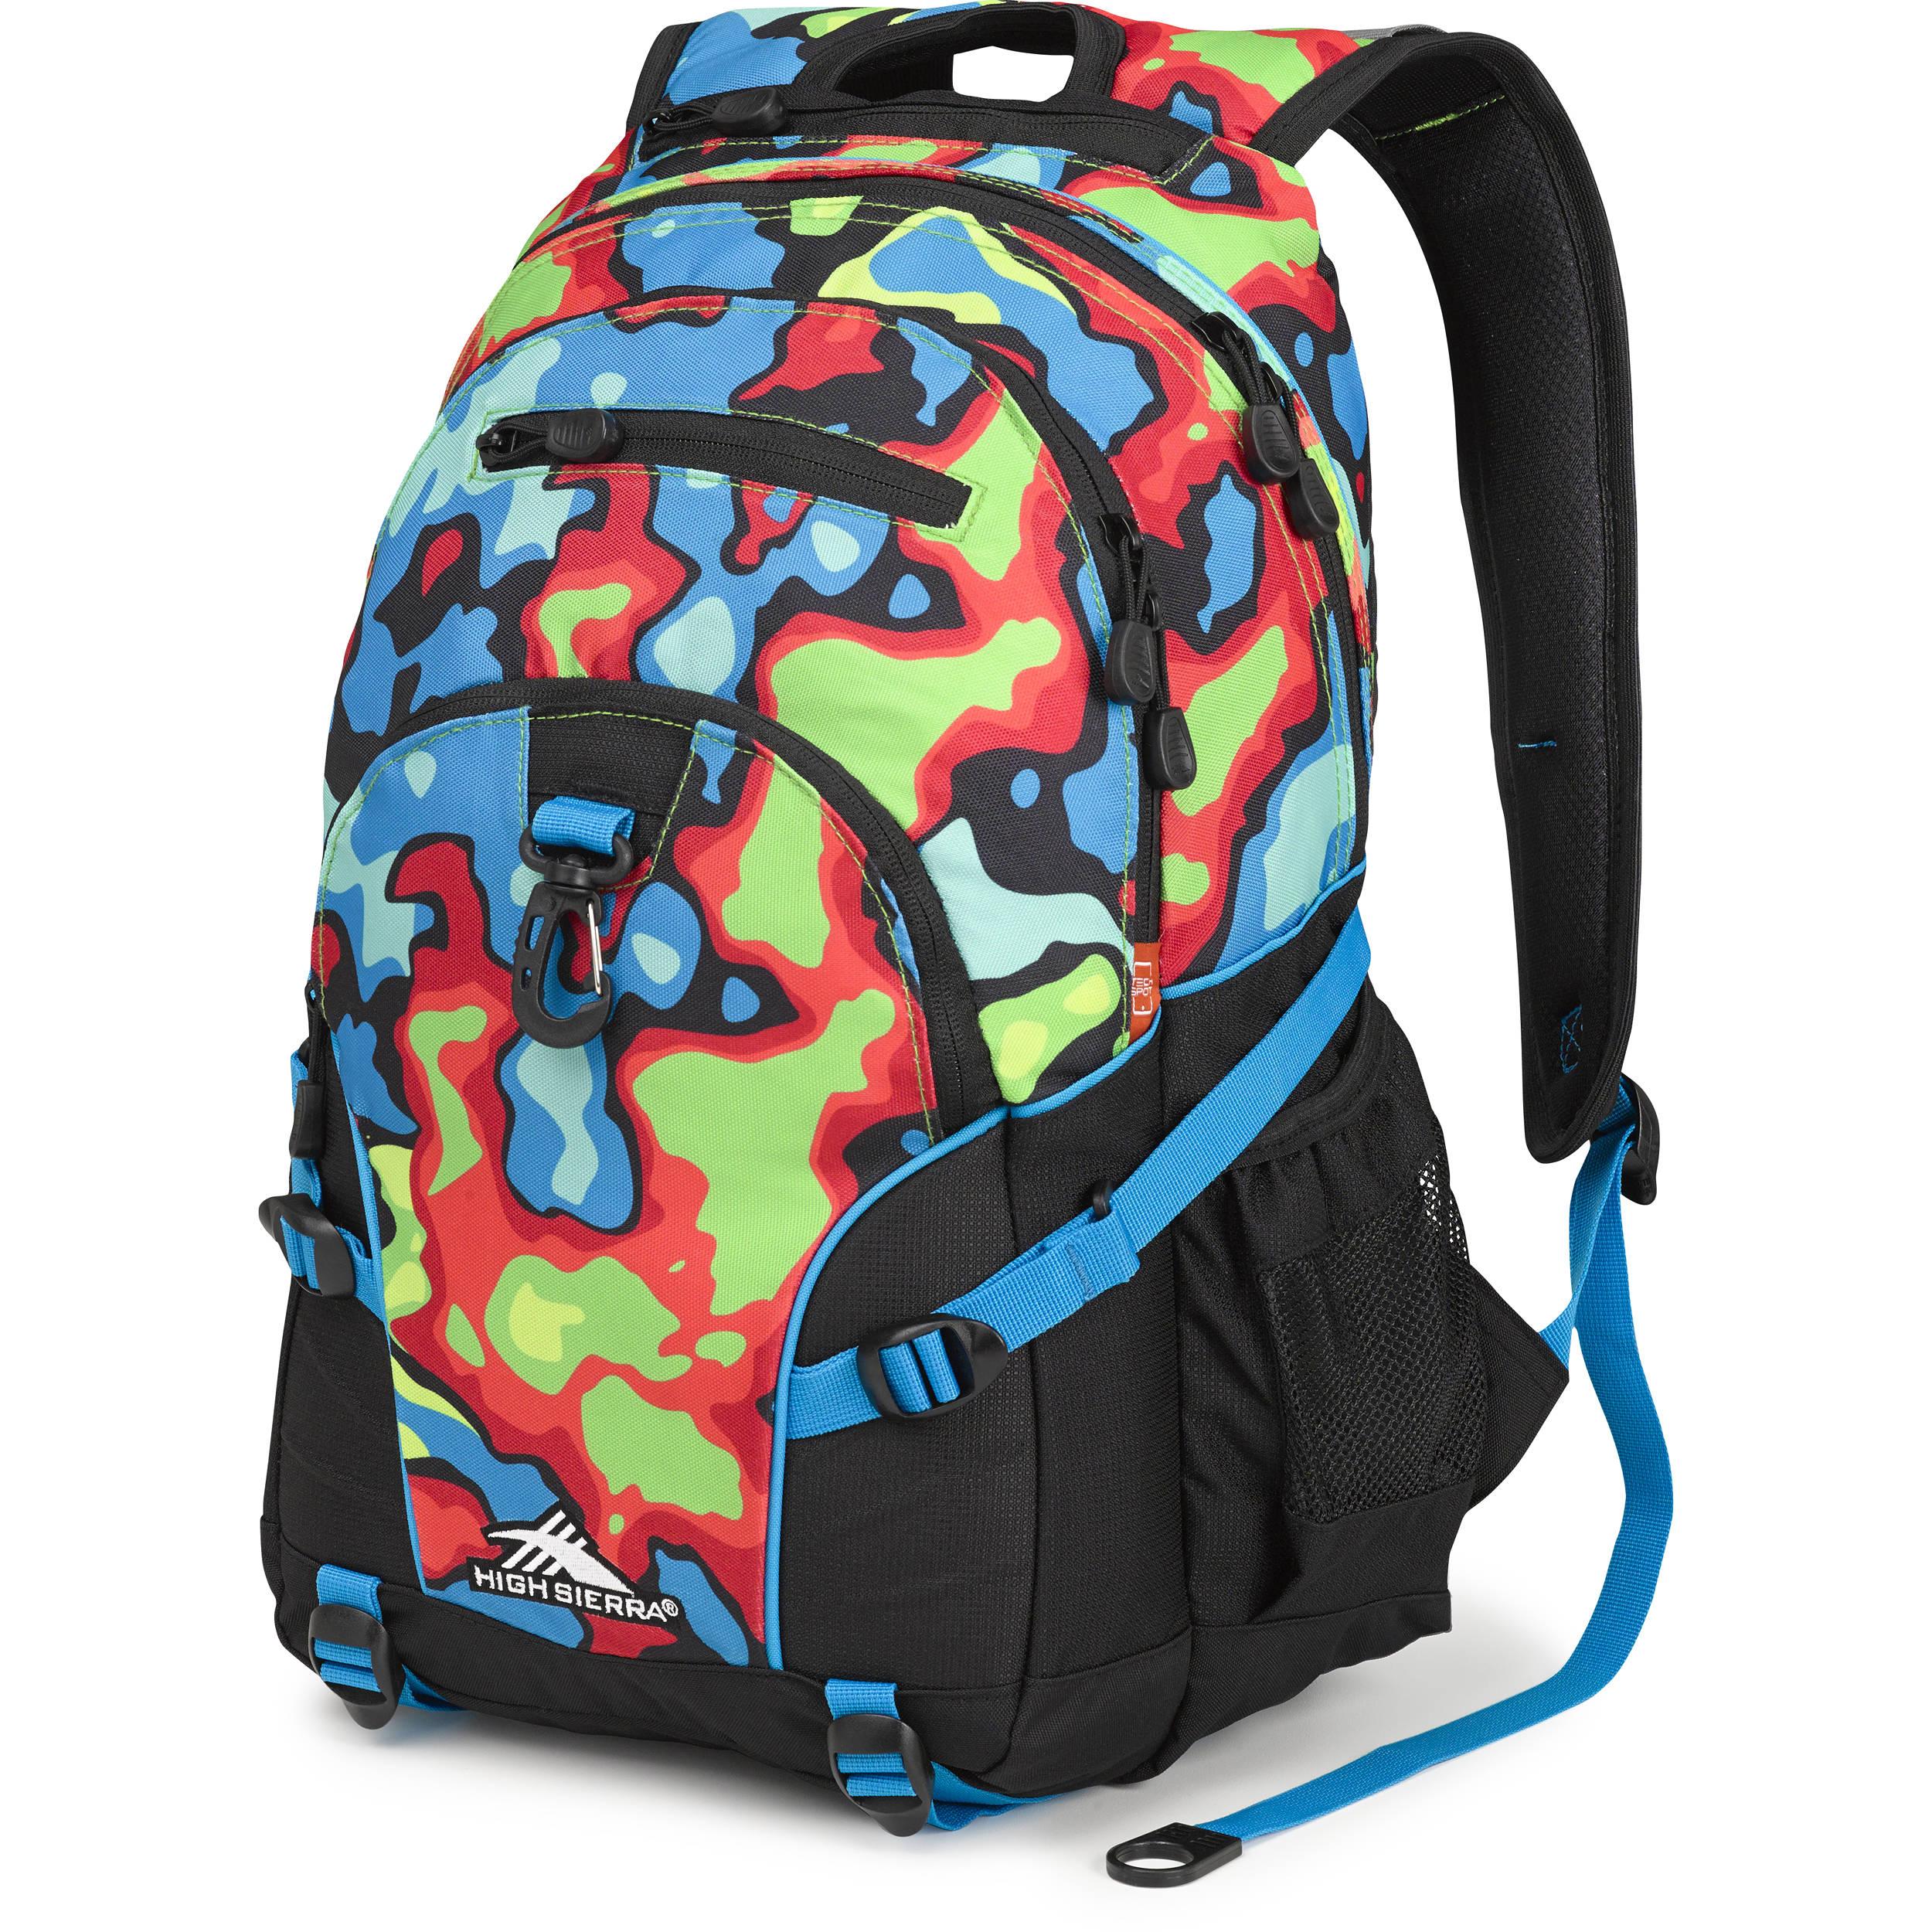 73f8fef72a80 High Sierra Loop Backpack- Fenix Toulouse Handball